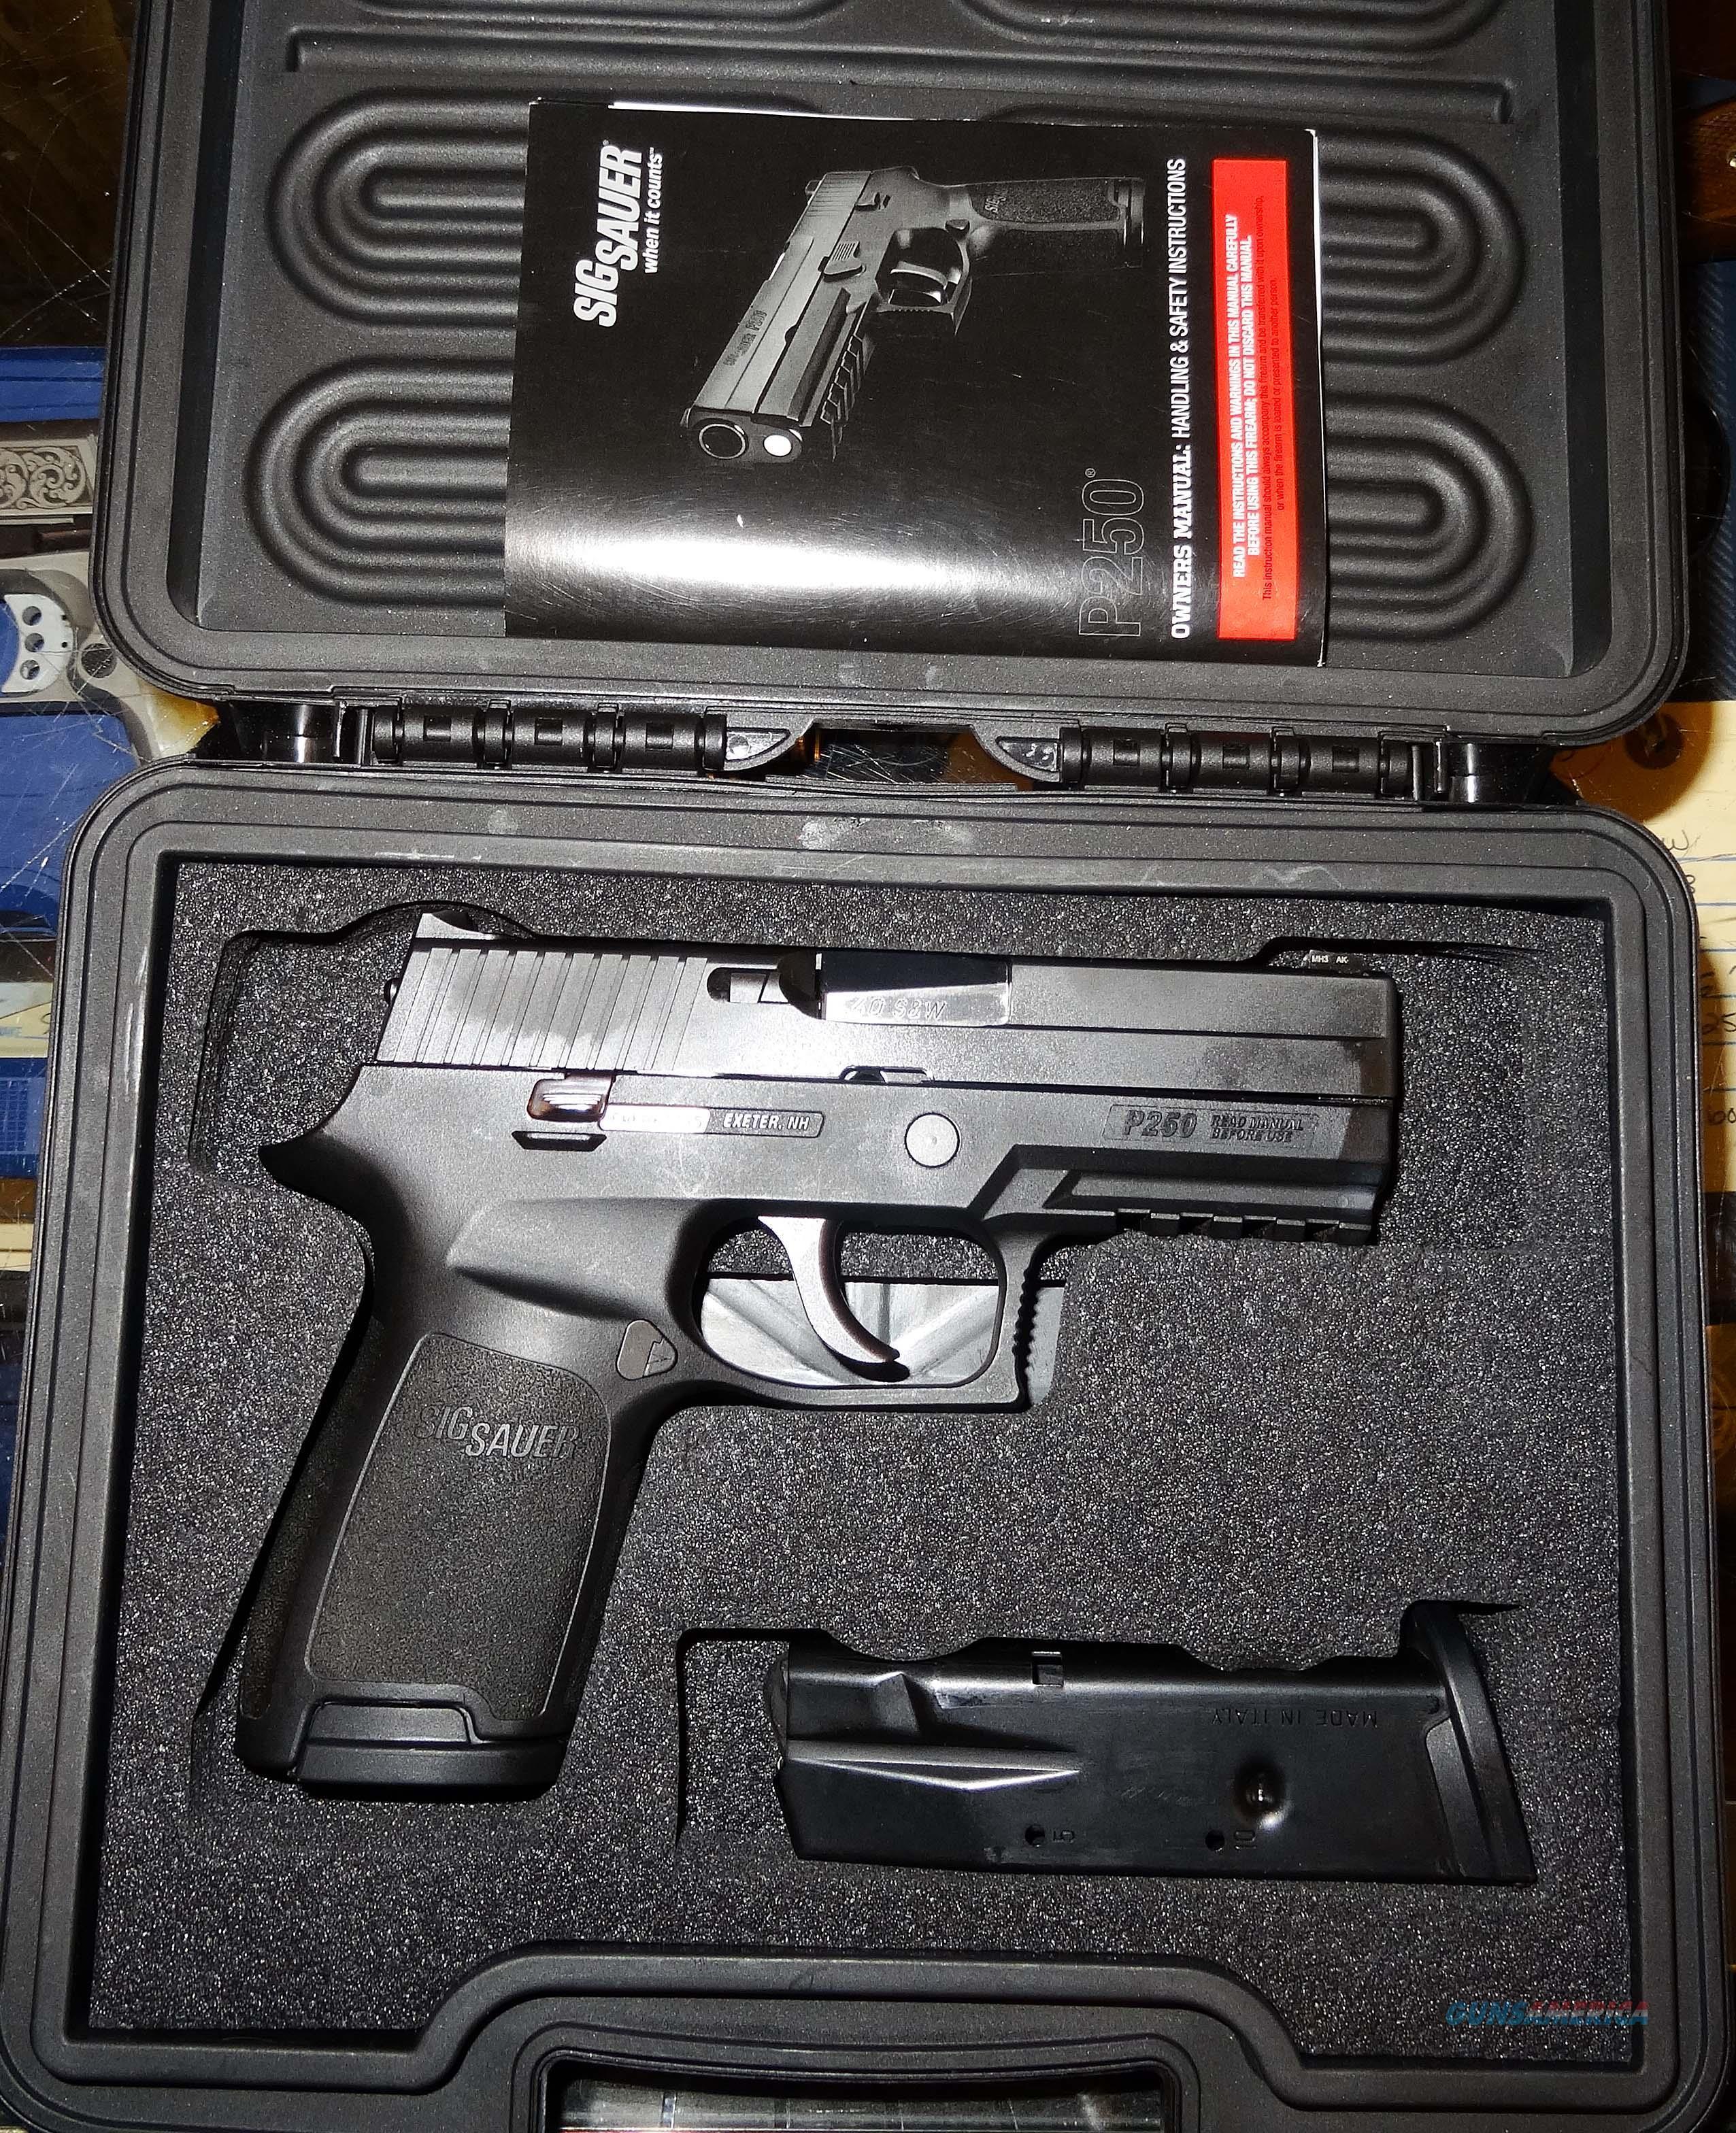 SIG SAUER P250  Guns > Pistols > Sig - Sauer/Sigarms Pistols > P250